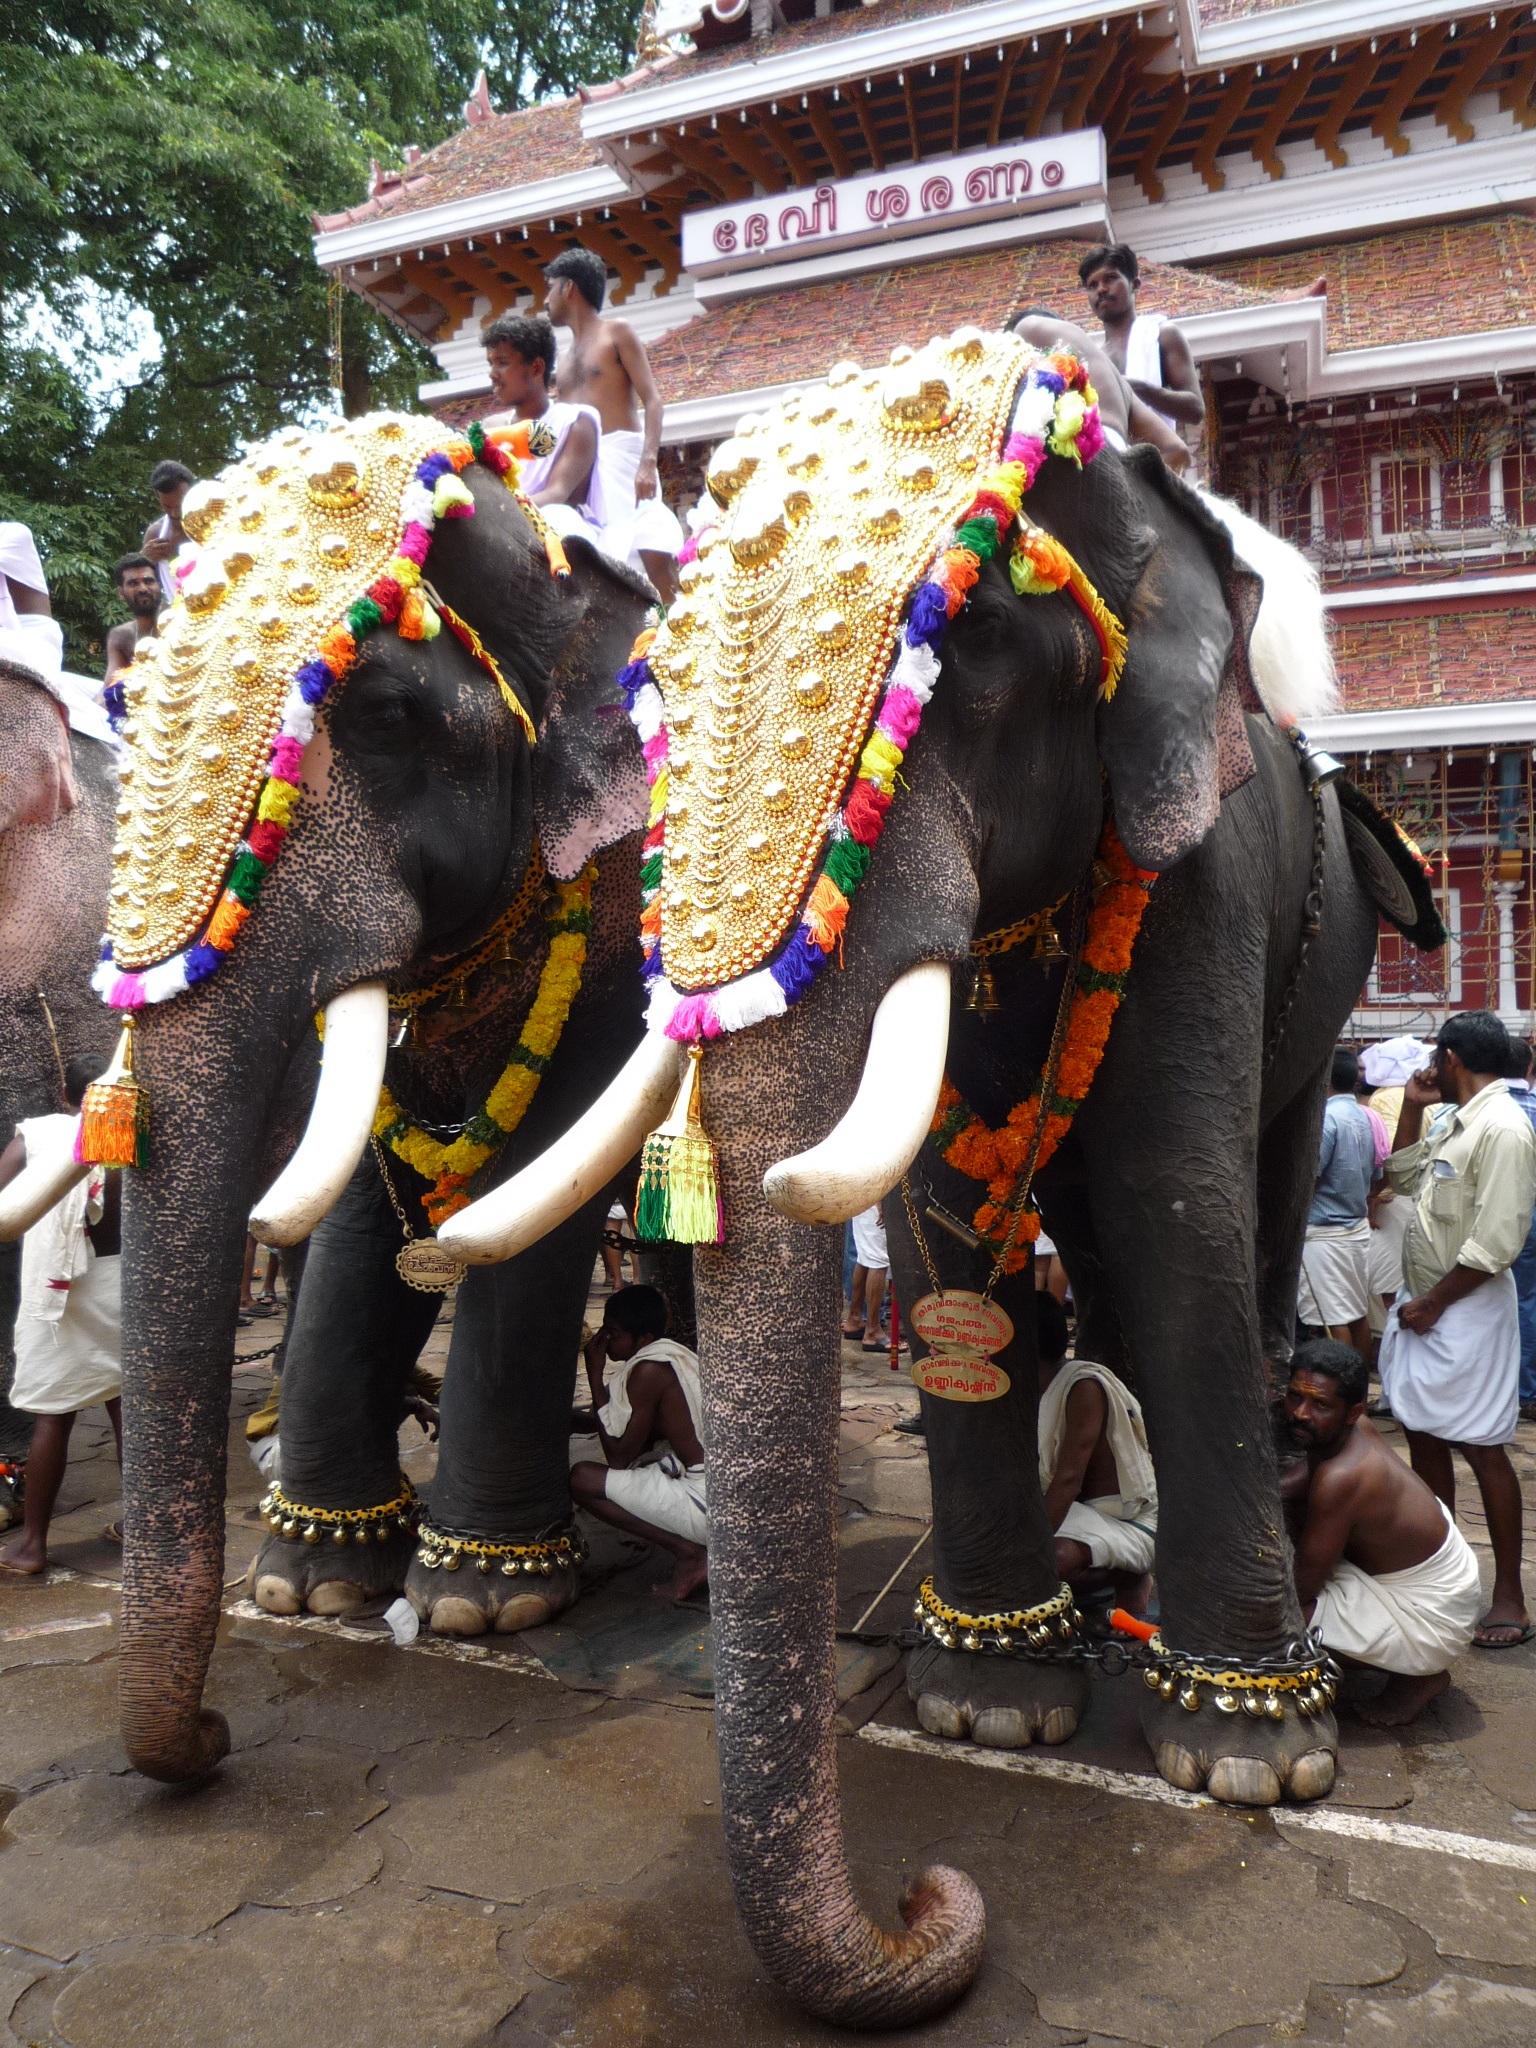 Free Images Travel Decoration Mammal Colorful Elephant